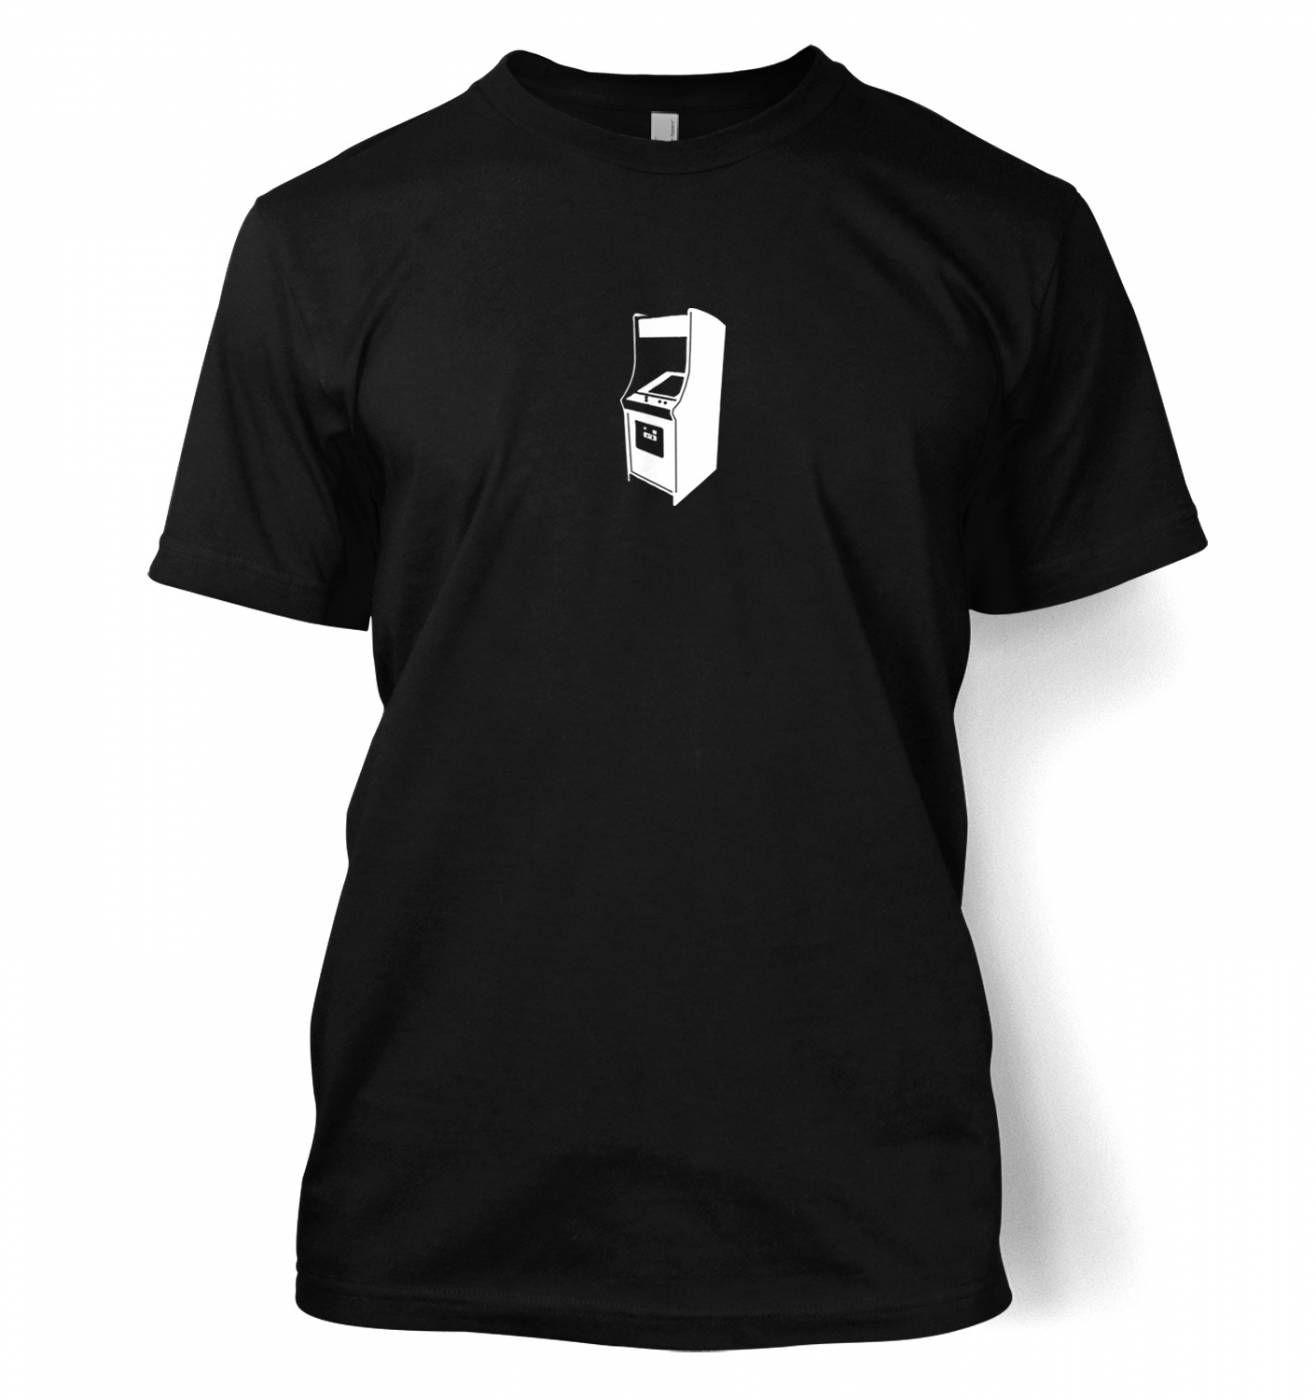 Retro Arcade Cabinet men's t-shirt